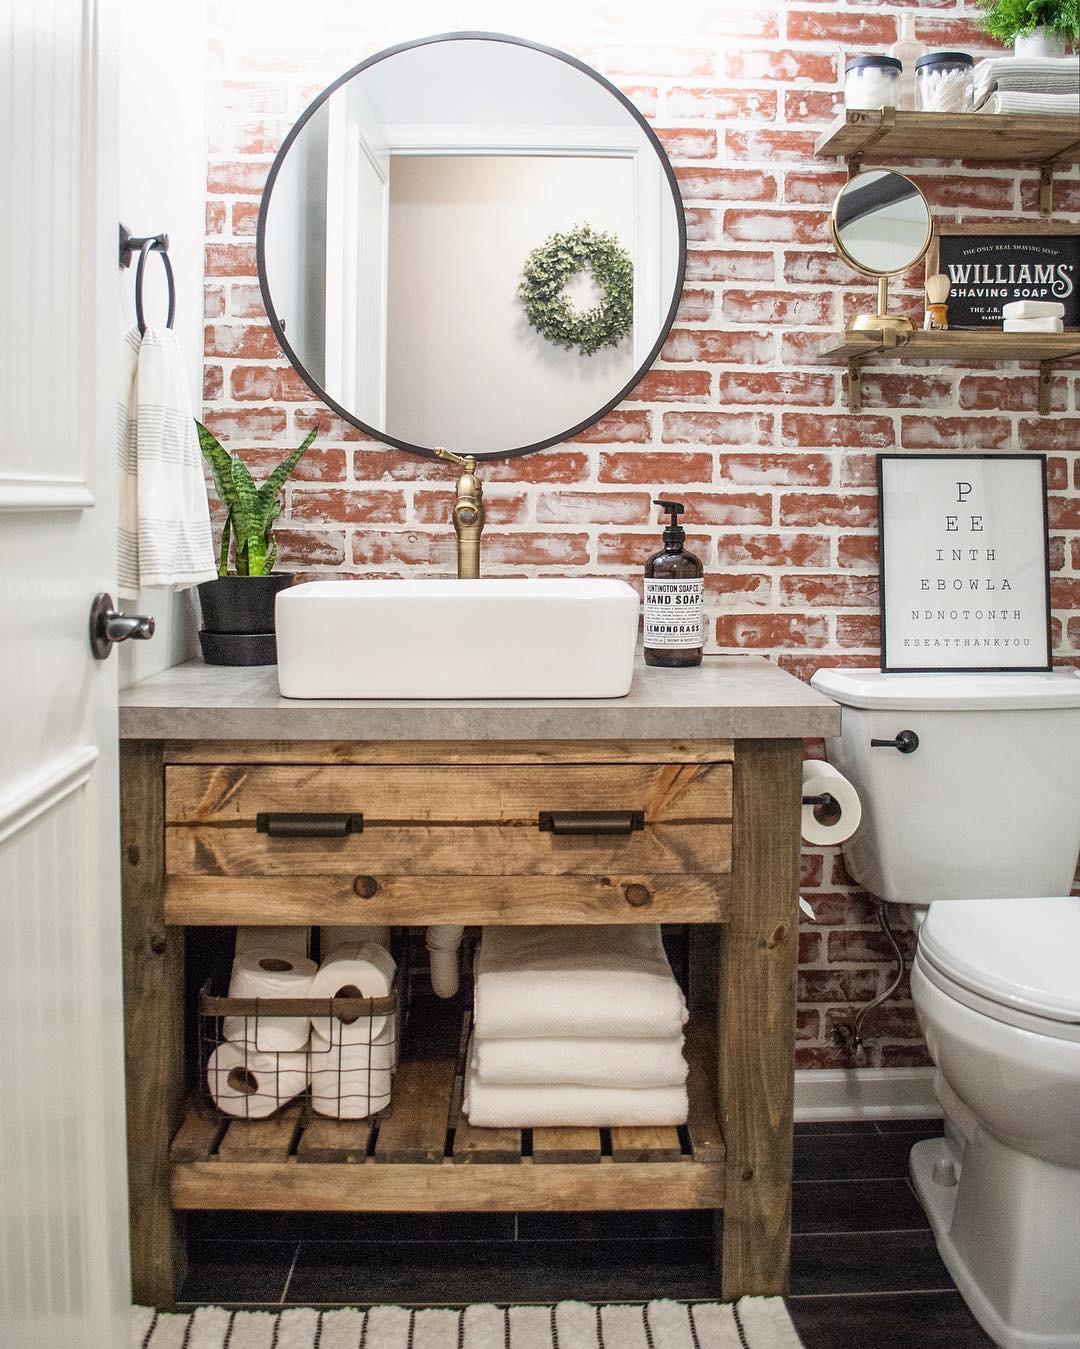 35 bathroomdesign Ideas You'll Love DIY;diybathroom;bathroomdesign;farmhousebathroom;simplehomestyle;fixerupperstyle;vintagefinds